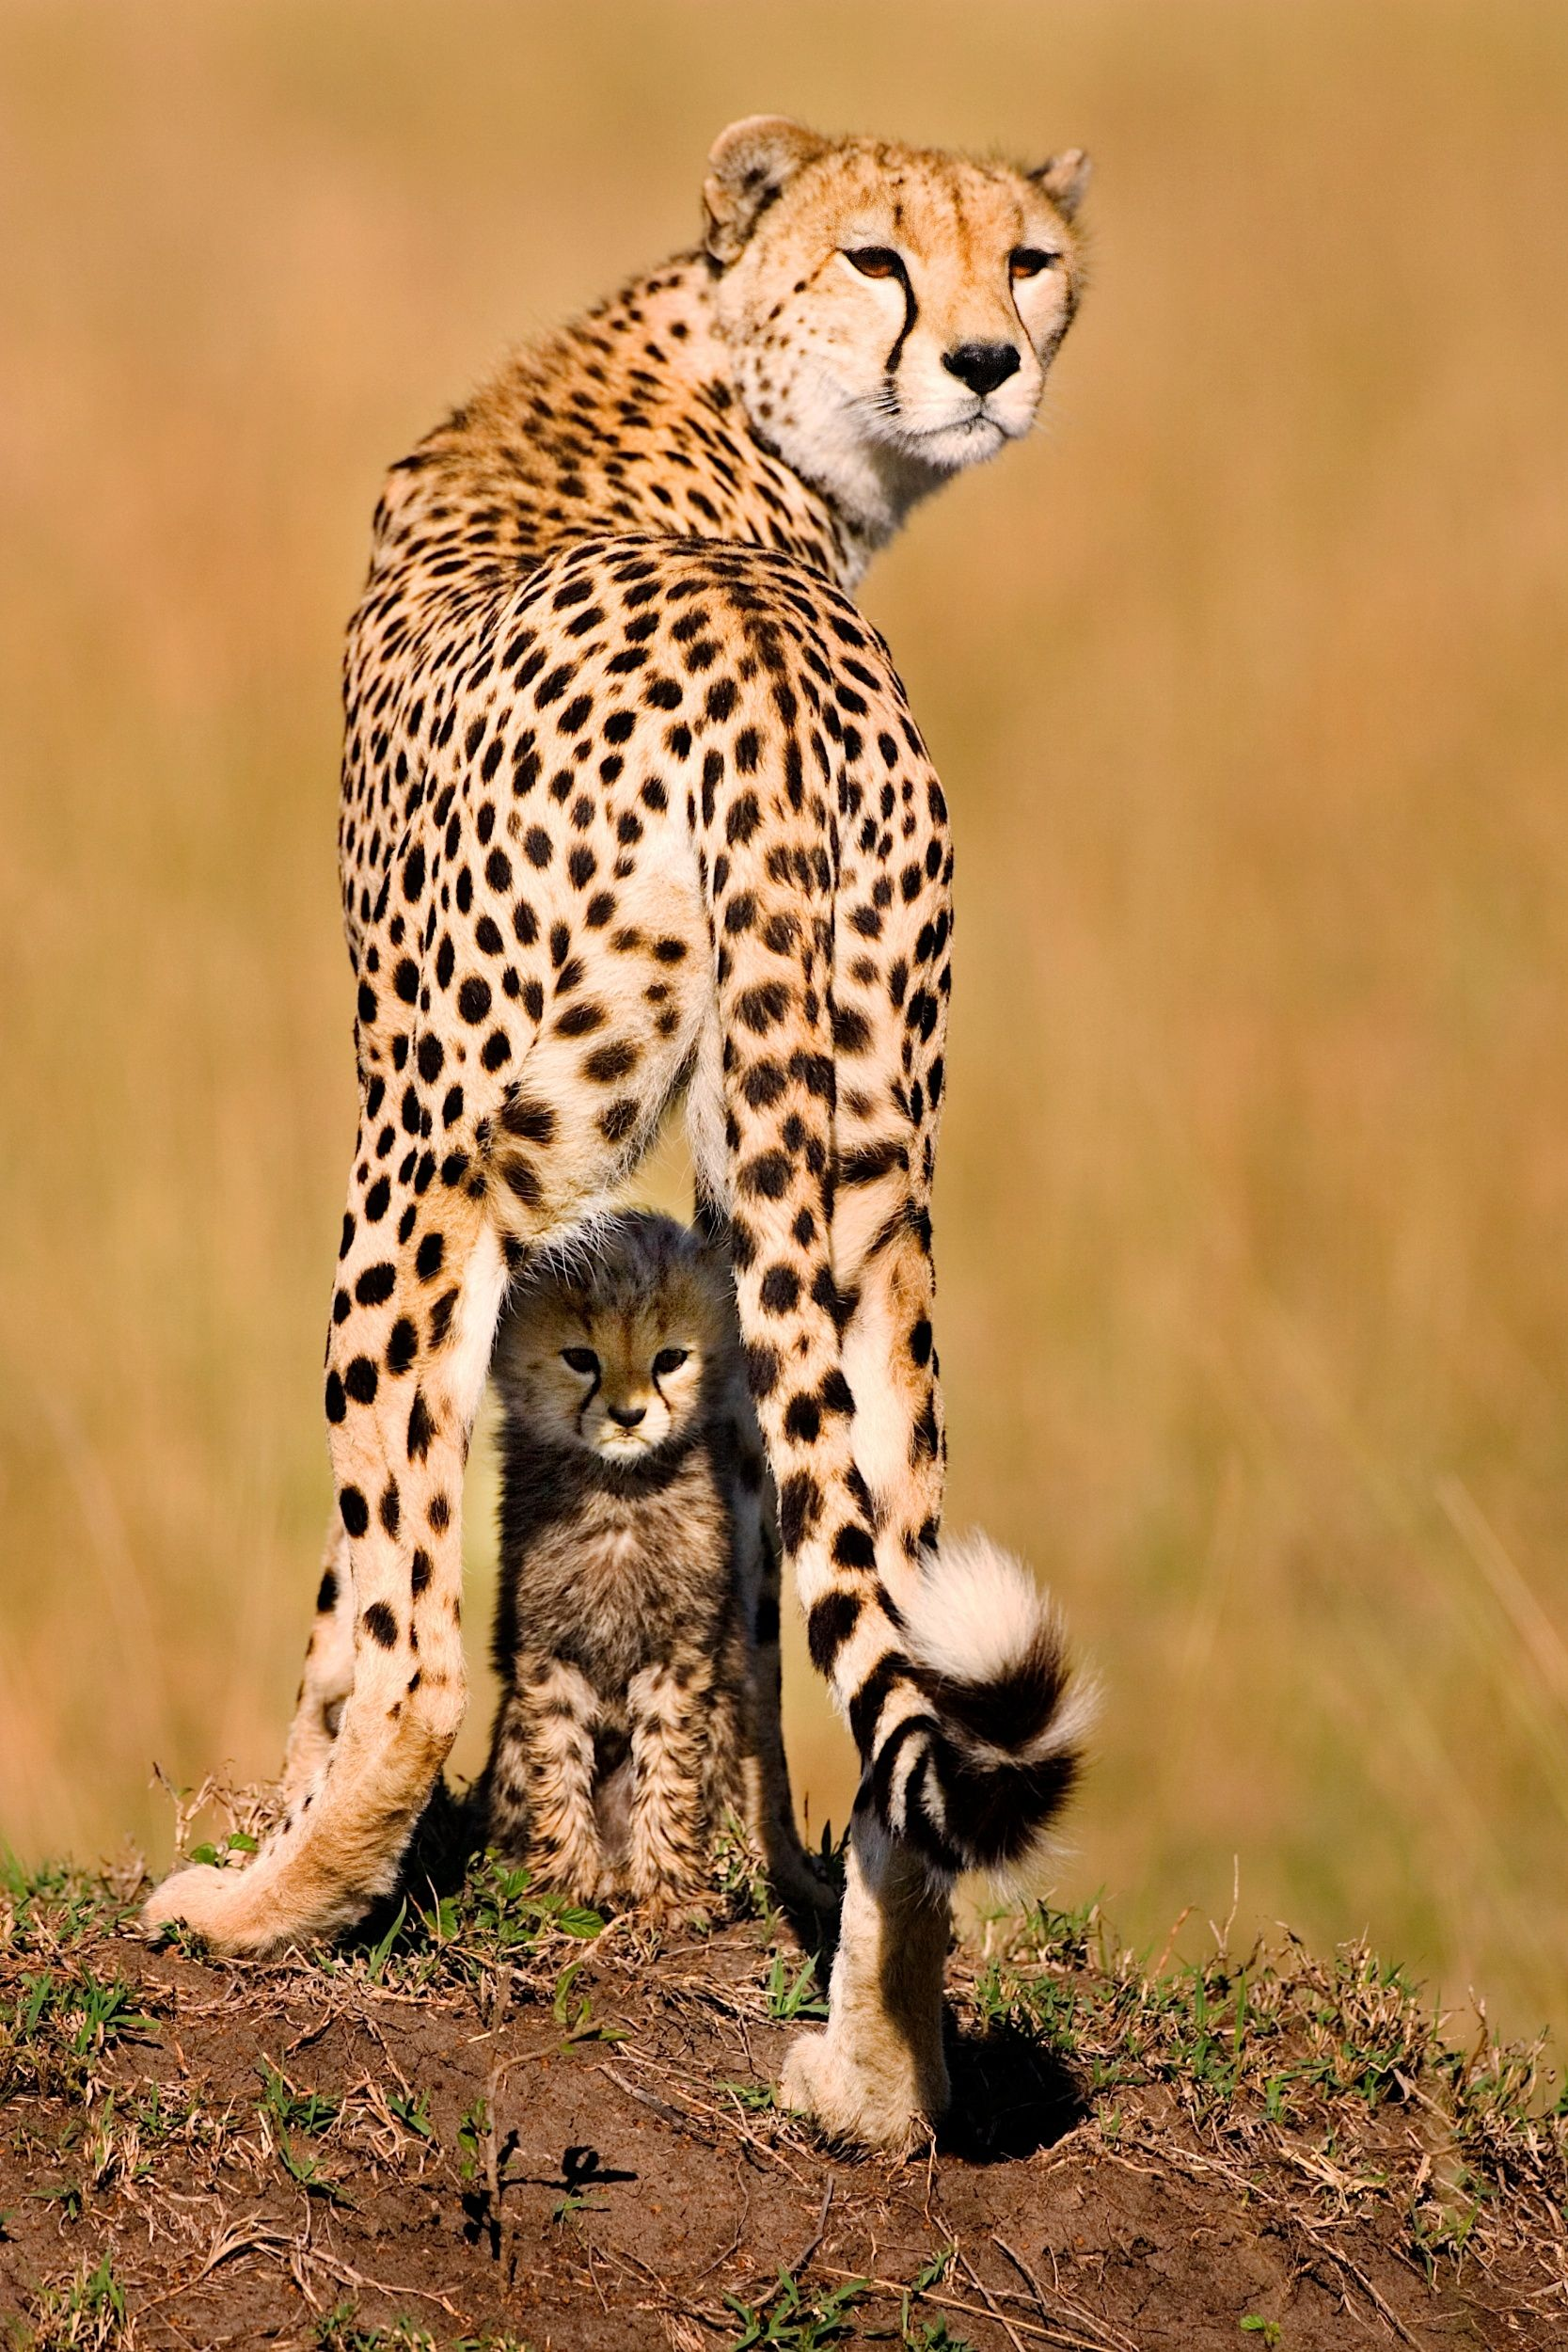 baby cheetah | Land Mammals | Pinterest